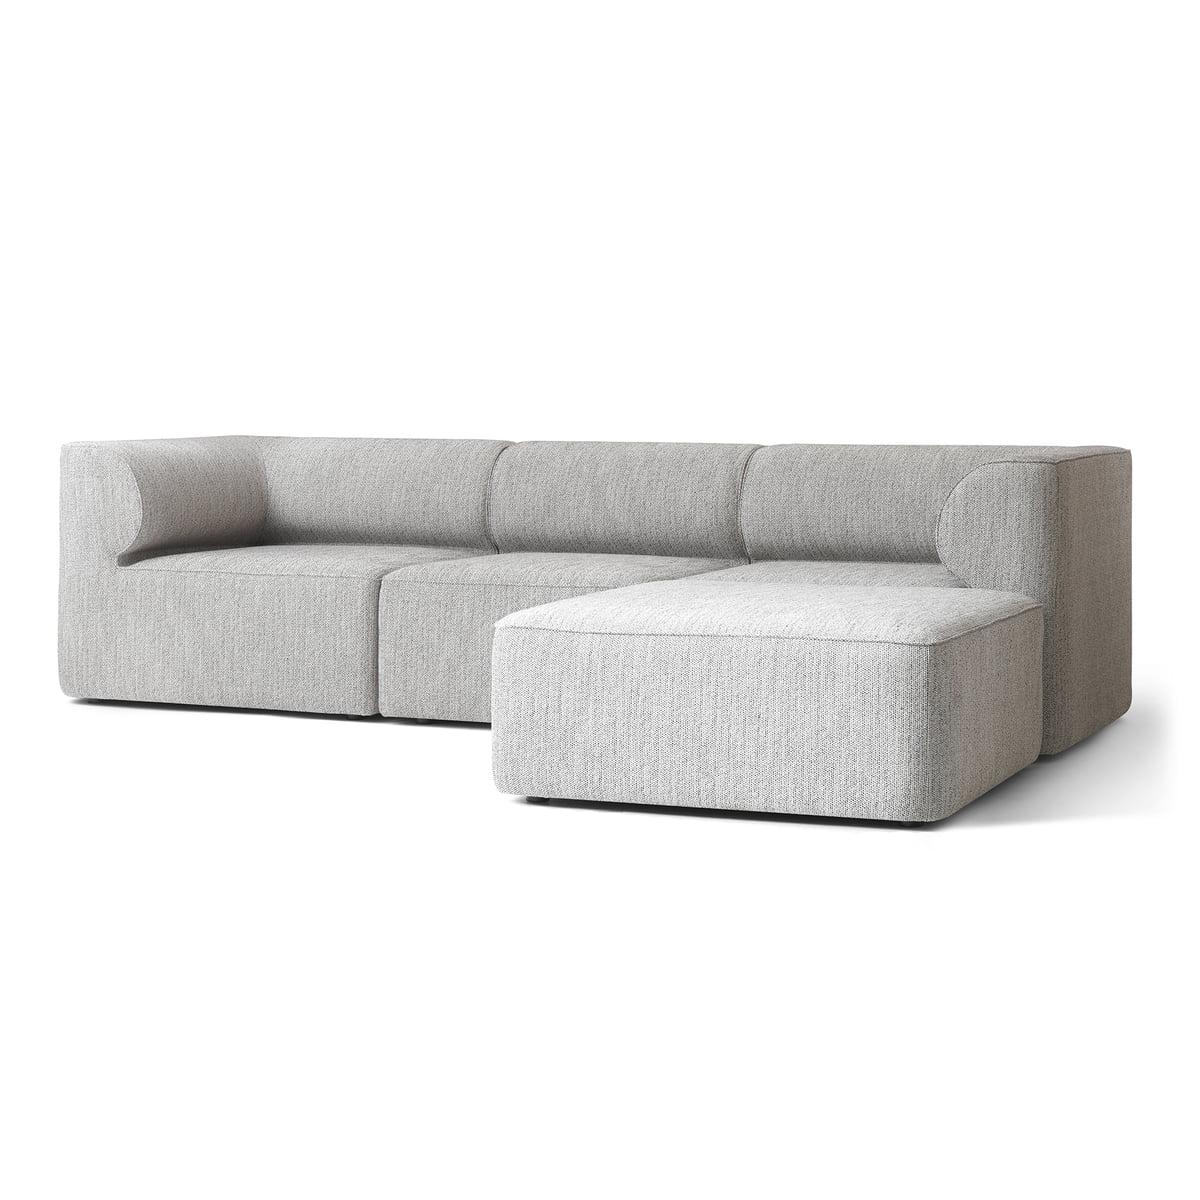 Eave modular sofa by menu connox for Modular sofa